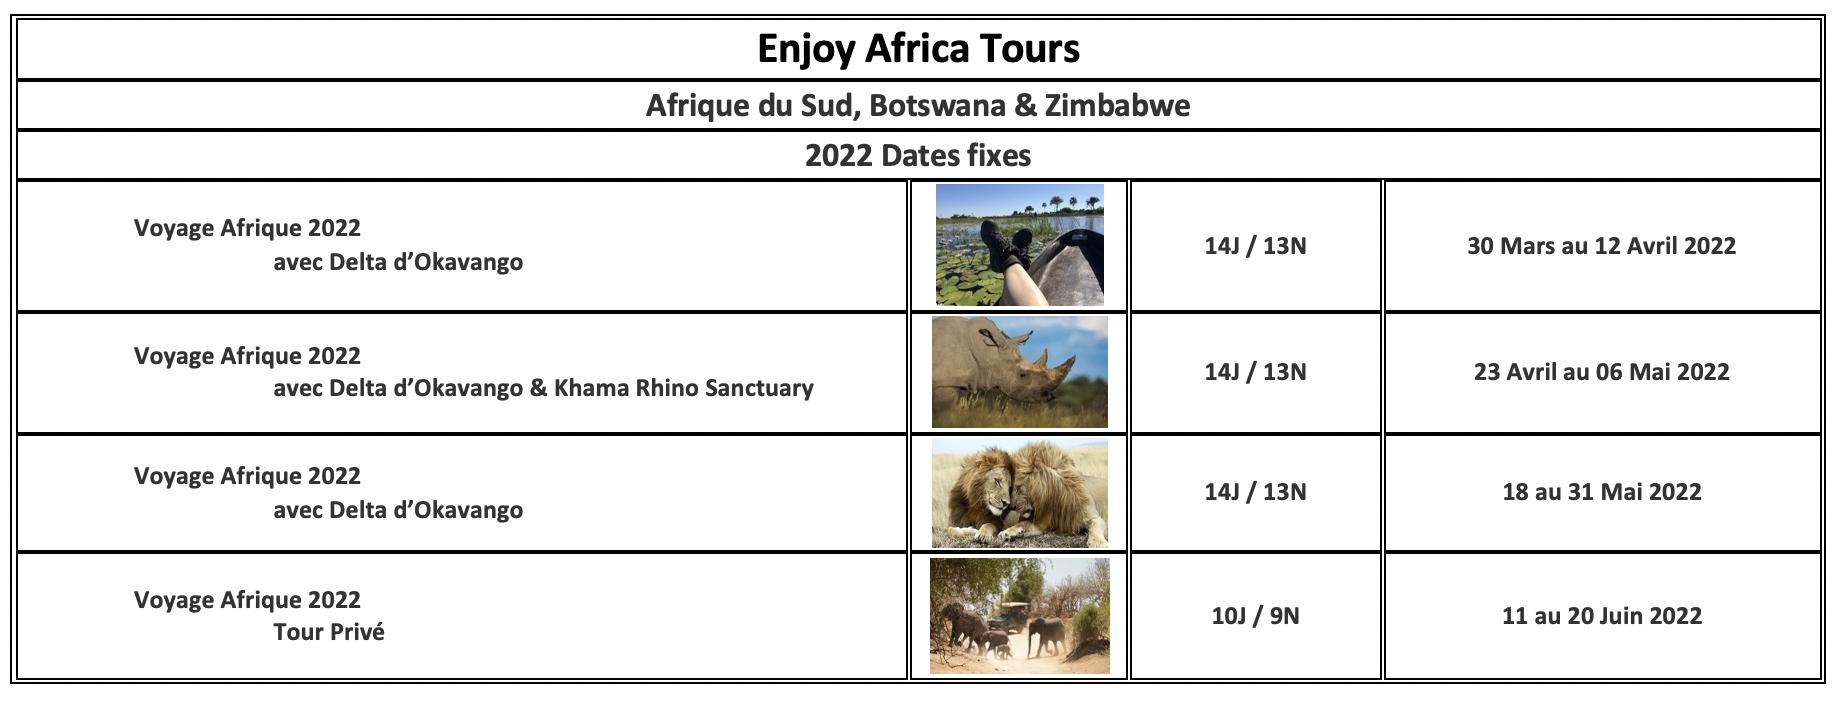 Enjoy Africa Tours 2022 French